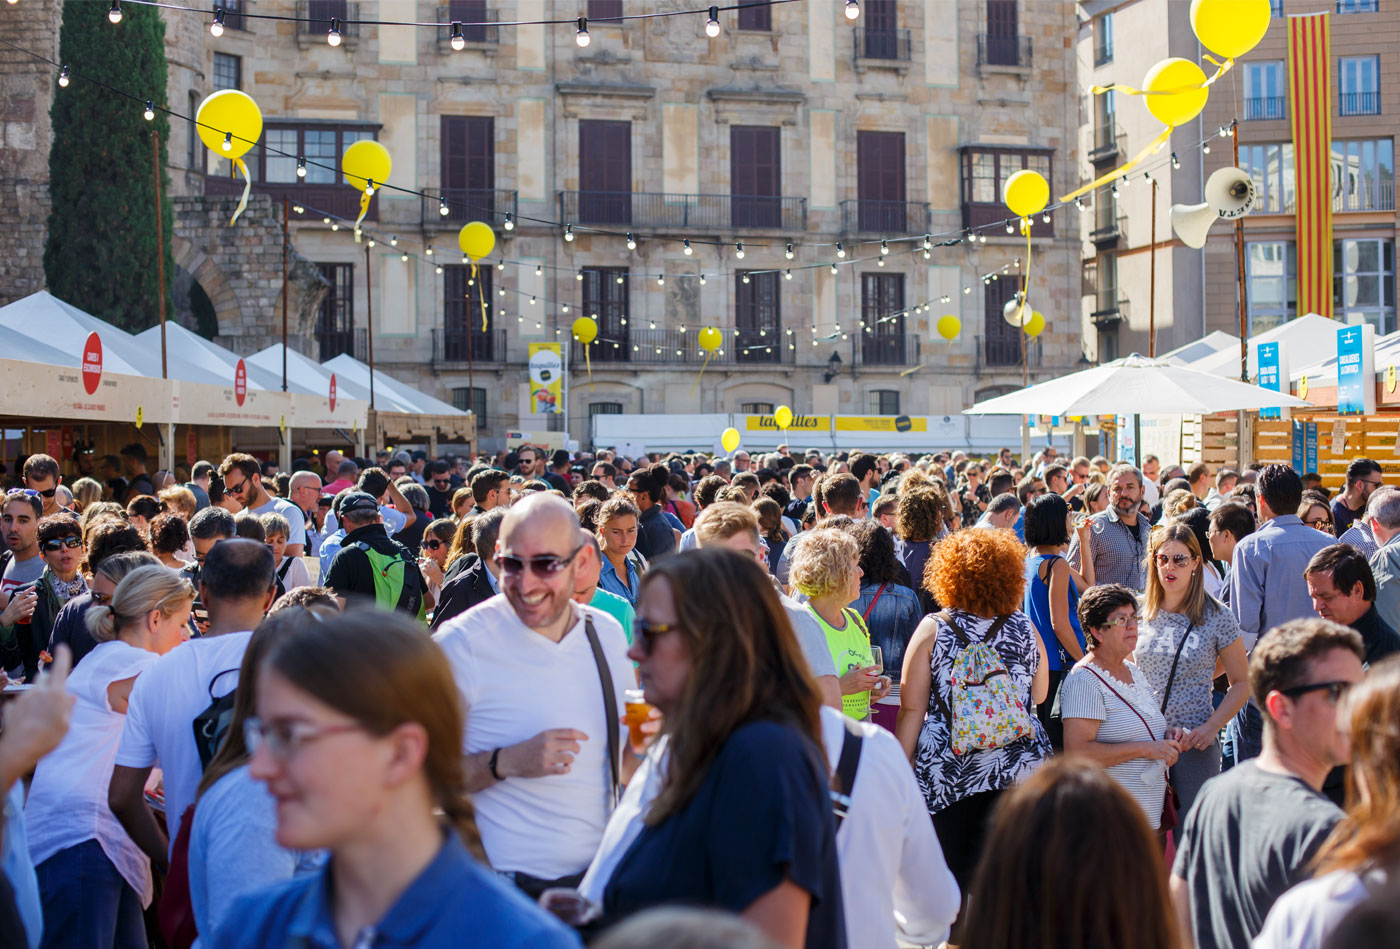 mercat-de-mercats-2017-catedral-barcelona-comida-tapas